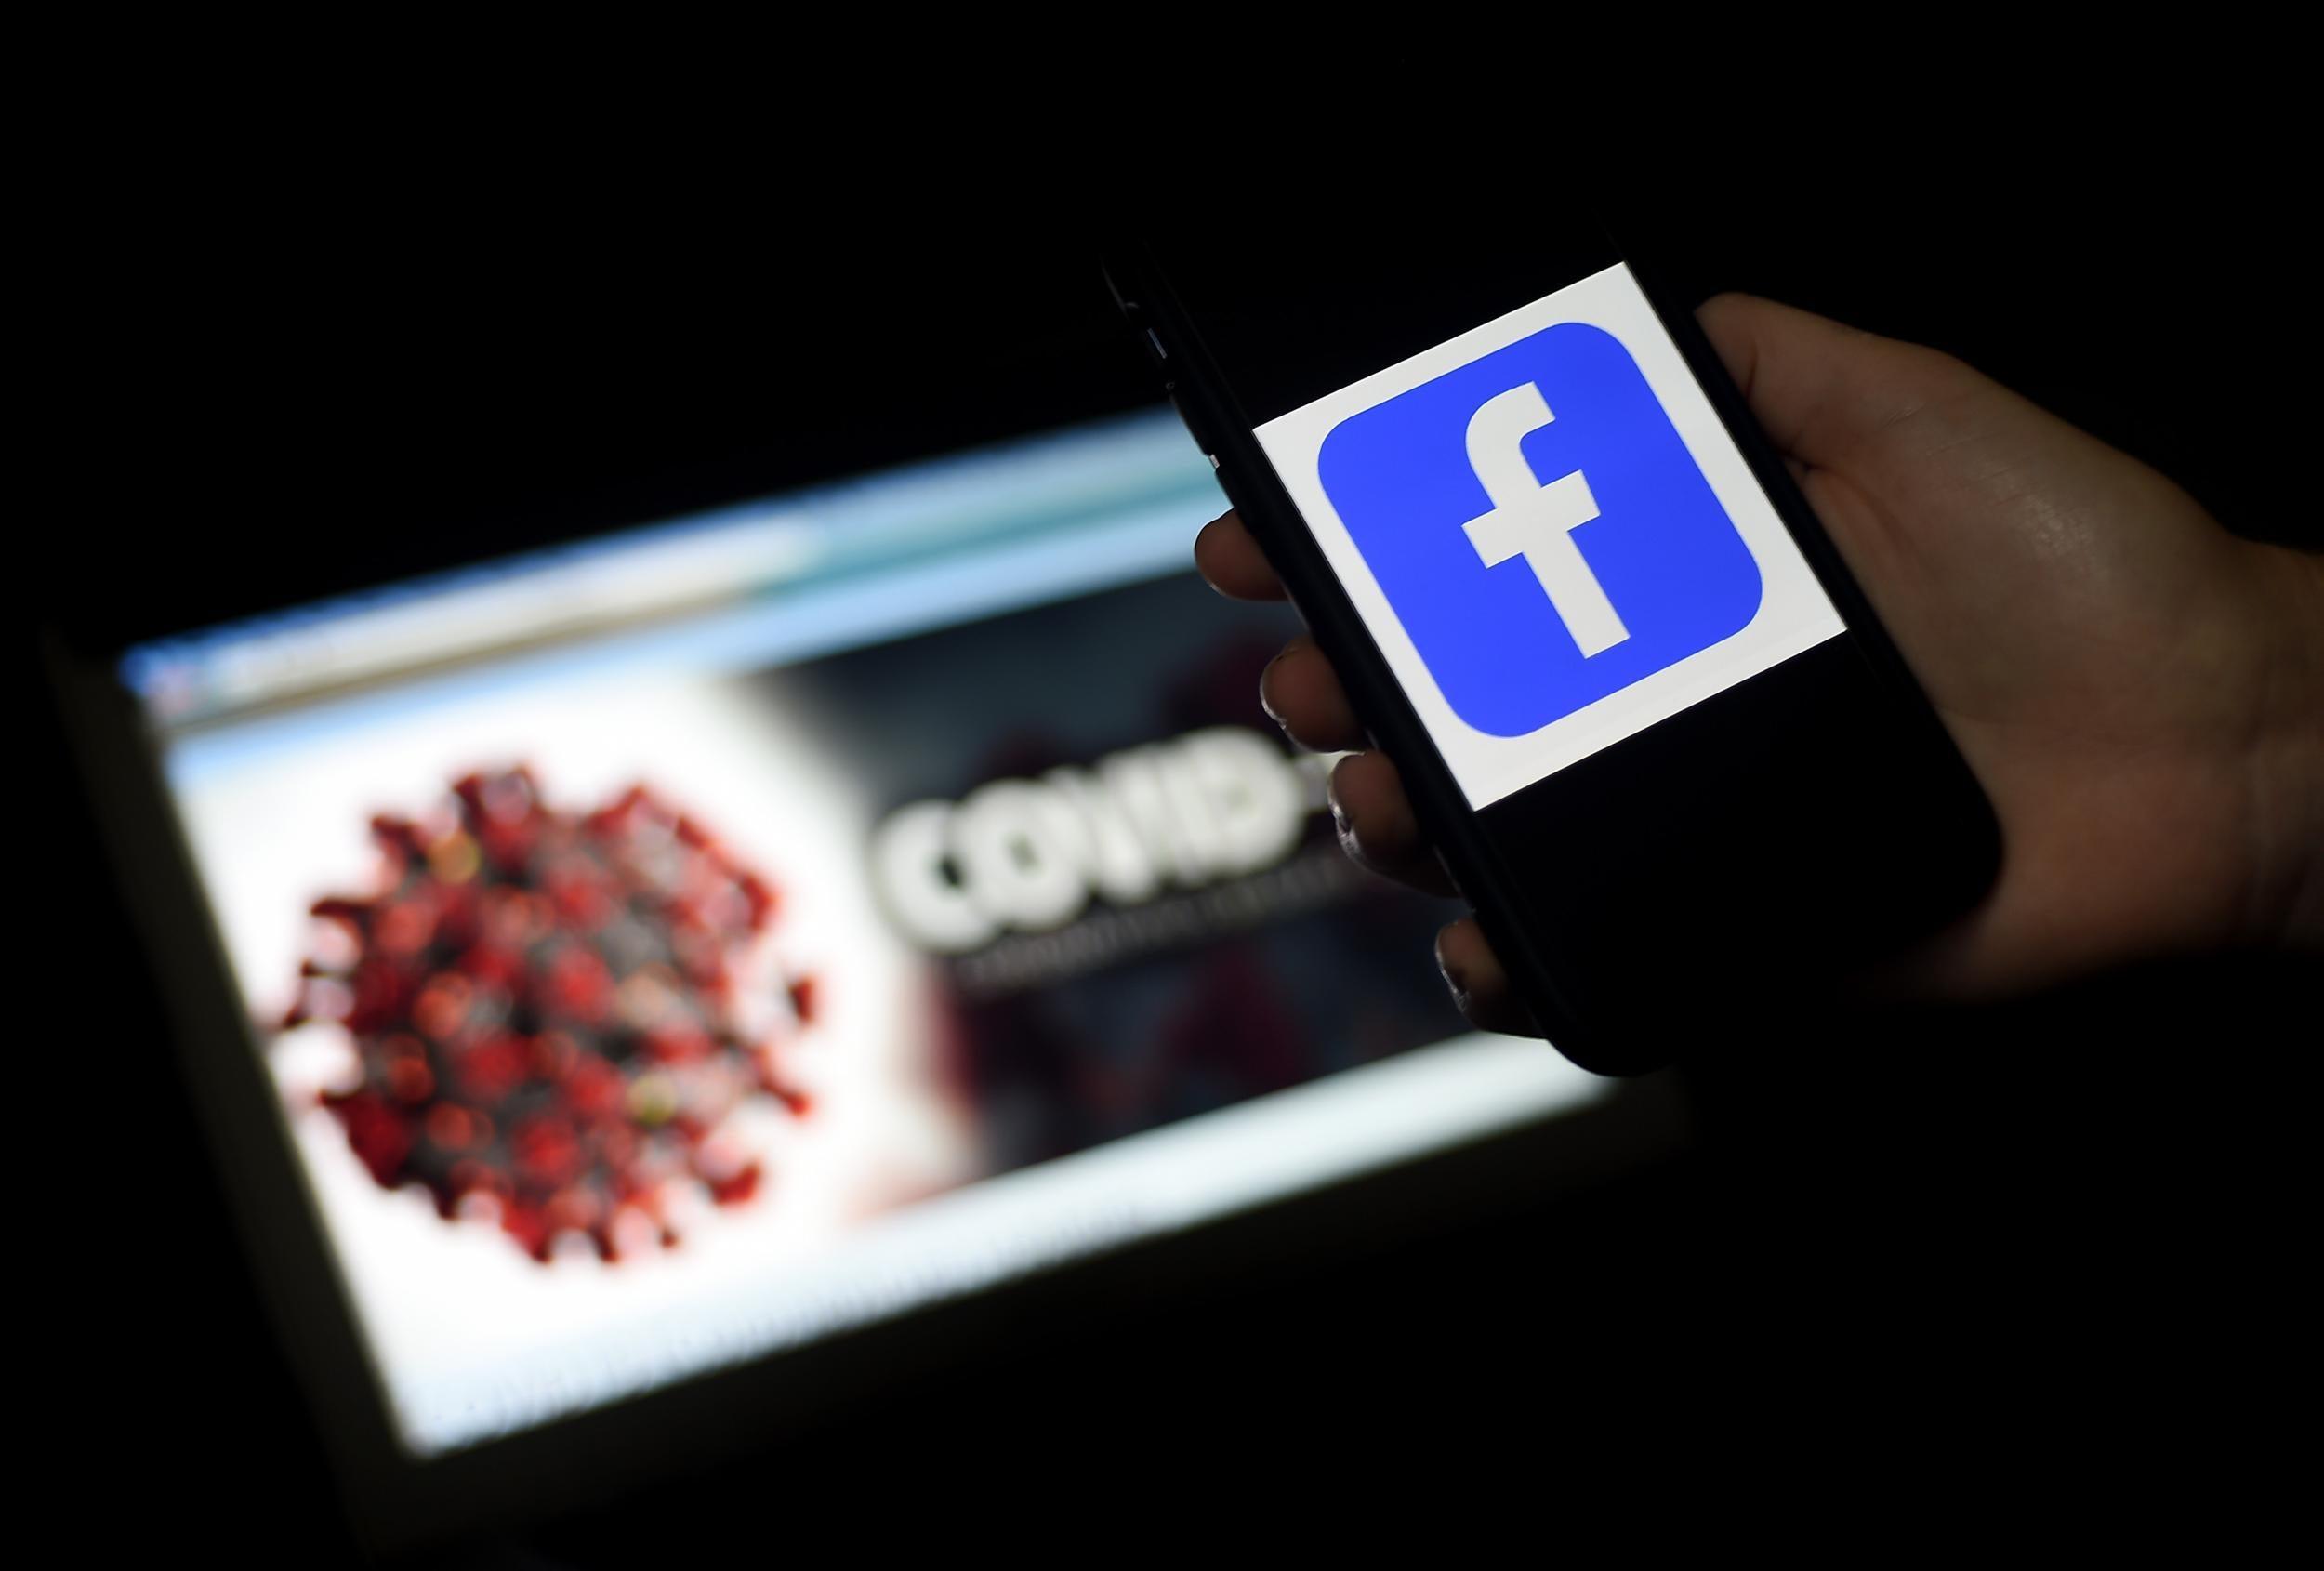 Facebook earnings rise but coronavirus leaves platform's future uncertain, according to Zuckerberg